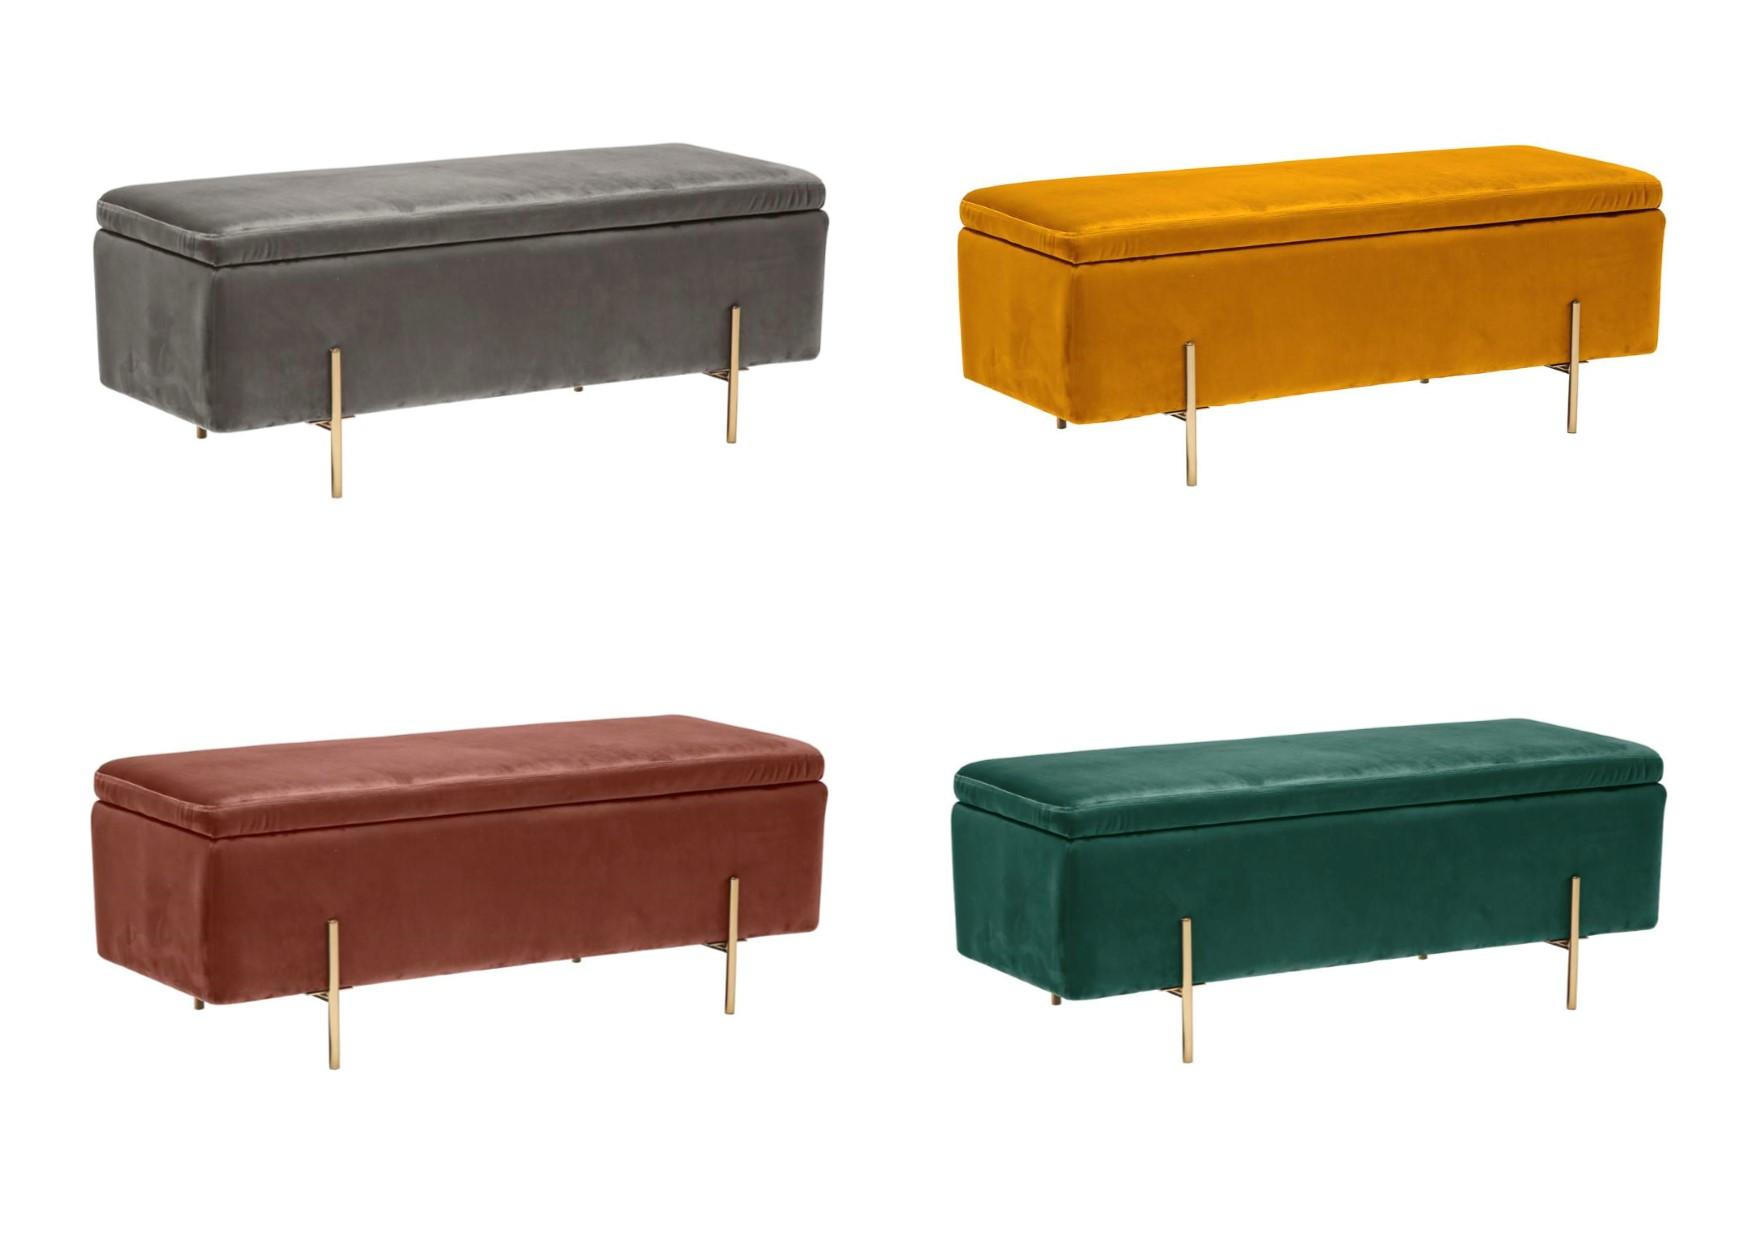 Lpd Lola Velvet Fabric Storage Ottoman Bench Grey Mustard Pink Teal Ebay